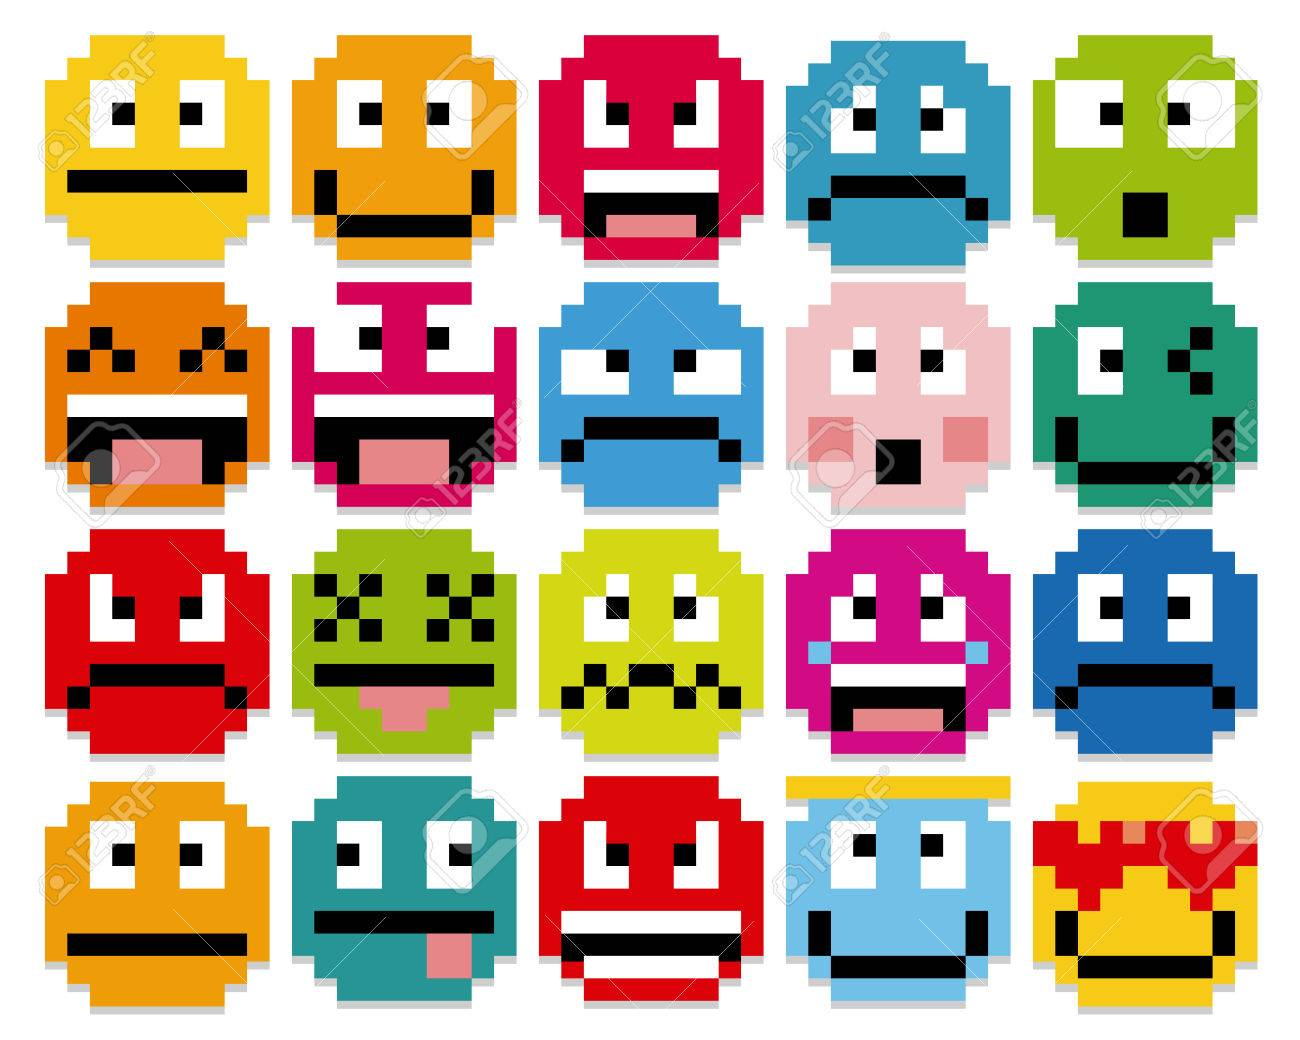 Vector Set Of Different Cartoon Pixel Faces - 35758810